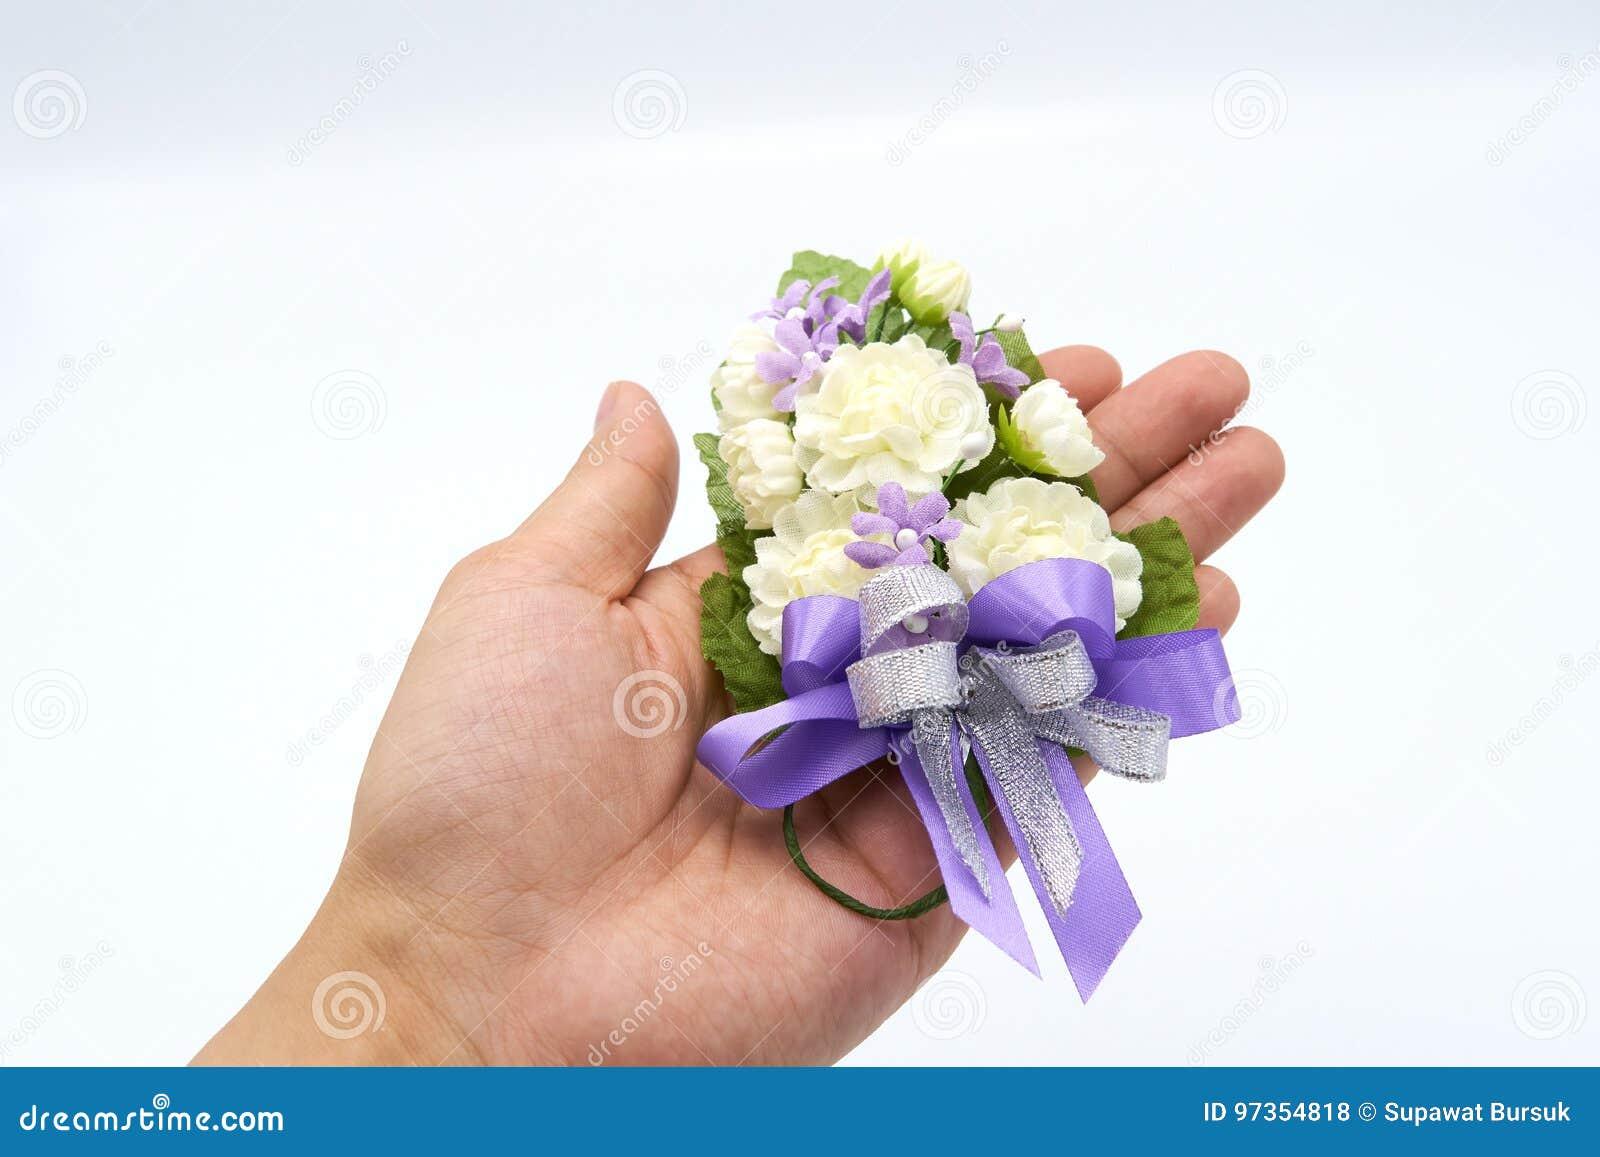 Jasmine Handmade Flowers Made From Handmade On The Palm Of The Hand